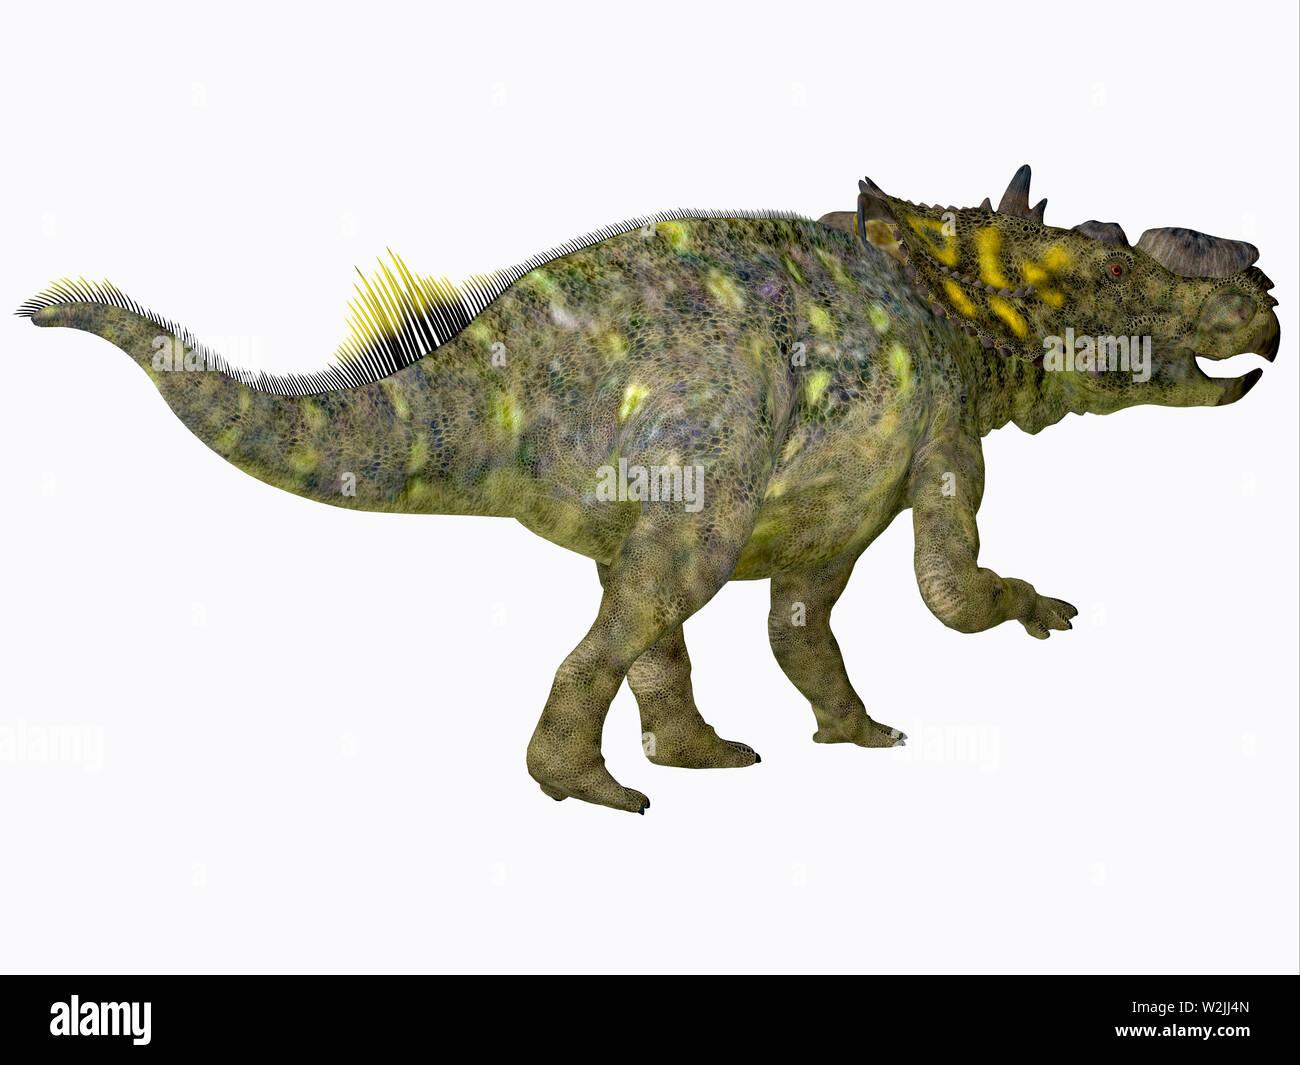 Pachyrhinosaurus Dinosaur - Pachyrhinosaurus was a Ceratopsian herbivorous beaked dinosaur that lived in Alberta, Canada during the Cretaceous Period. Stock Photo